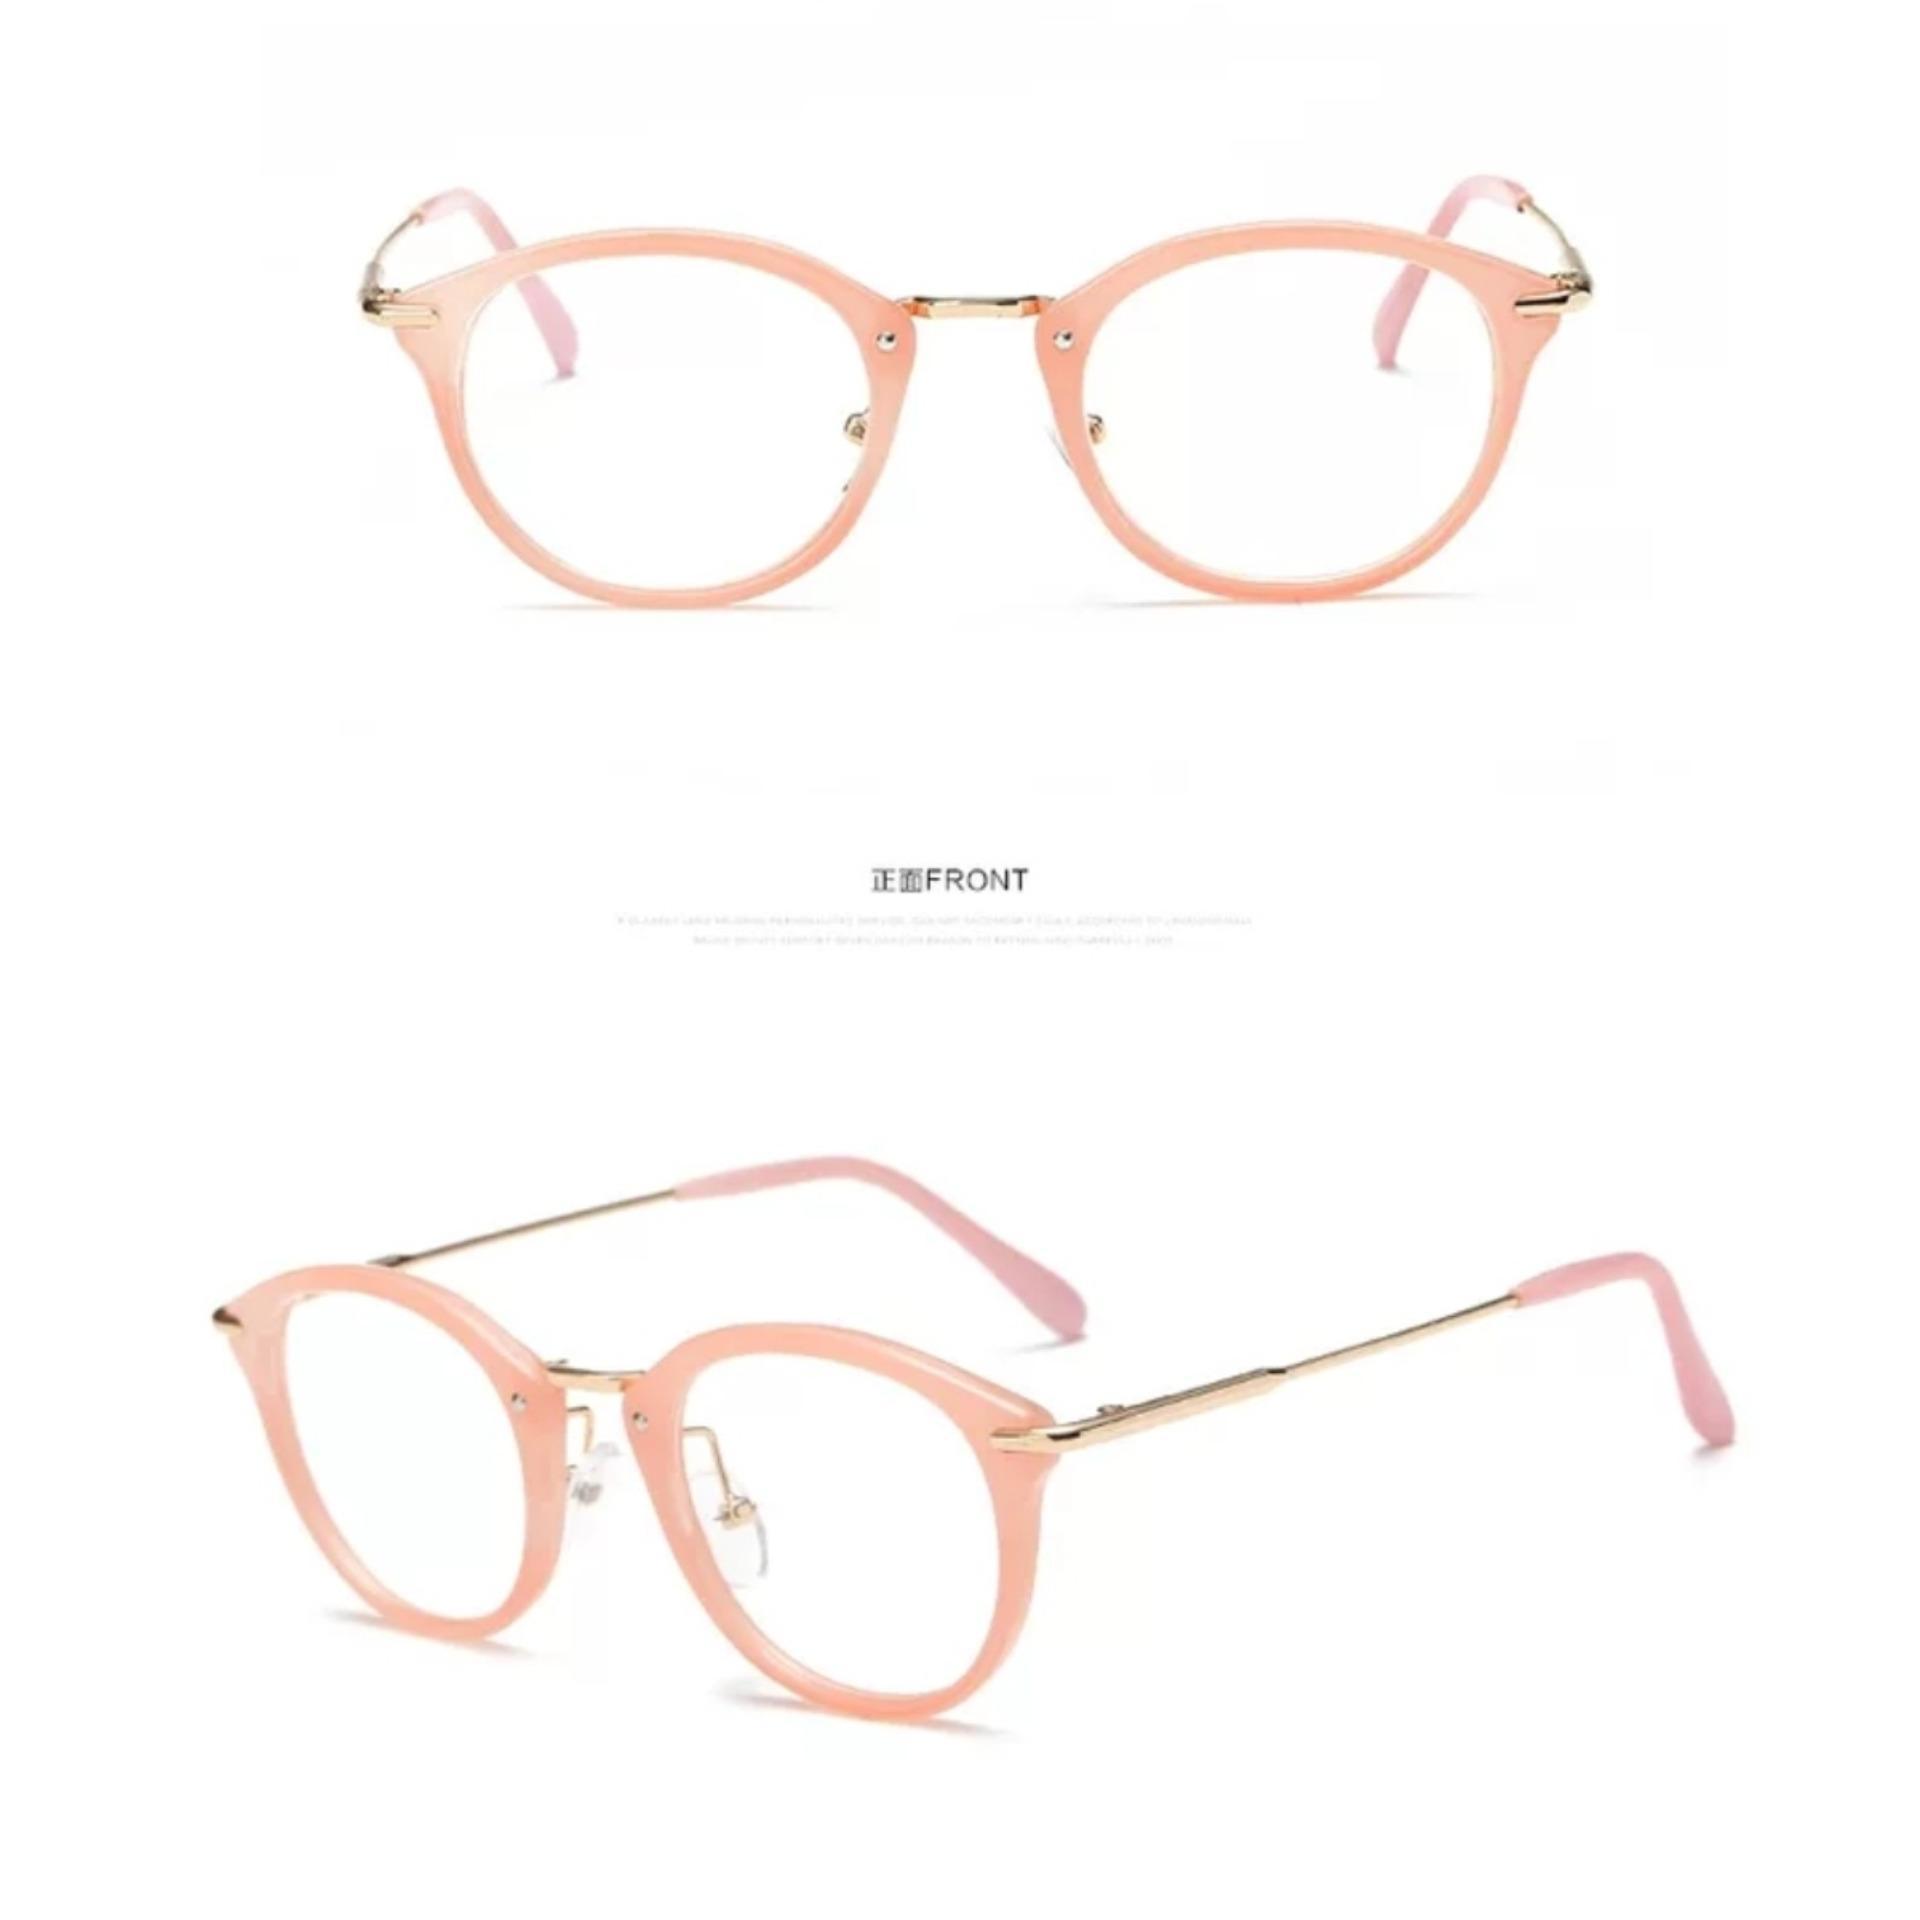 Timely - High Quality Charming Women's Round Clear Lens Glasses SUN 4480 - Kacamata Wanita -